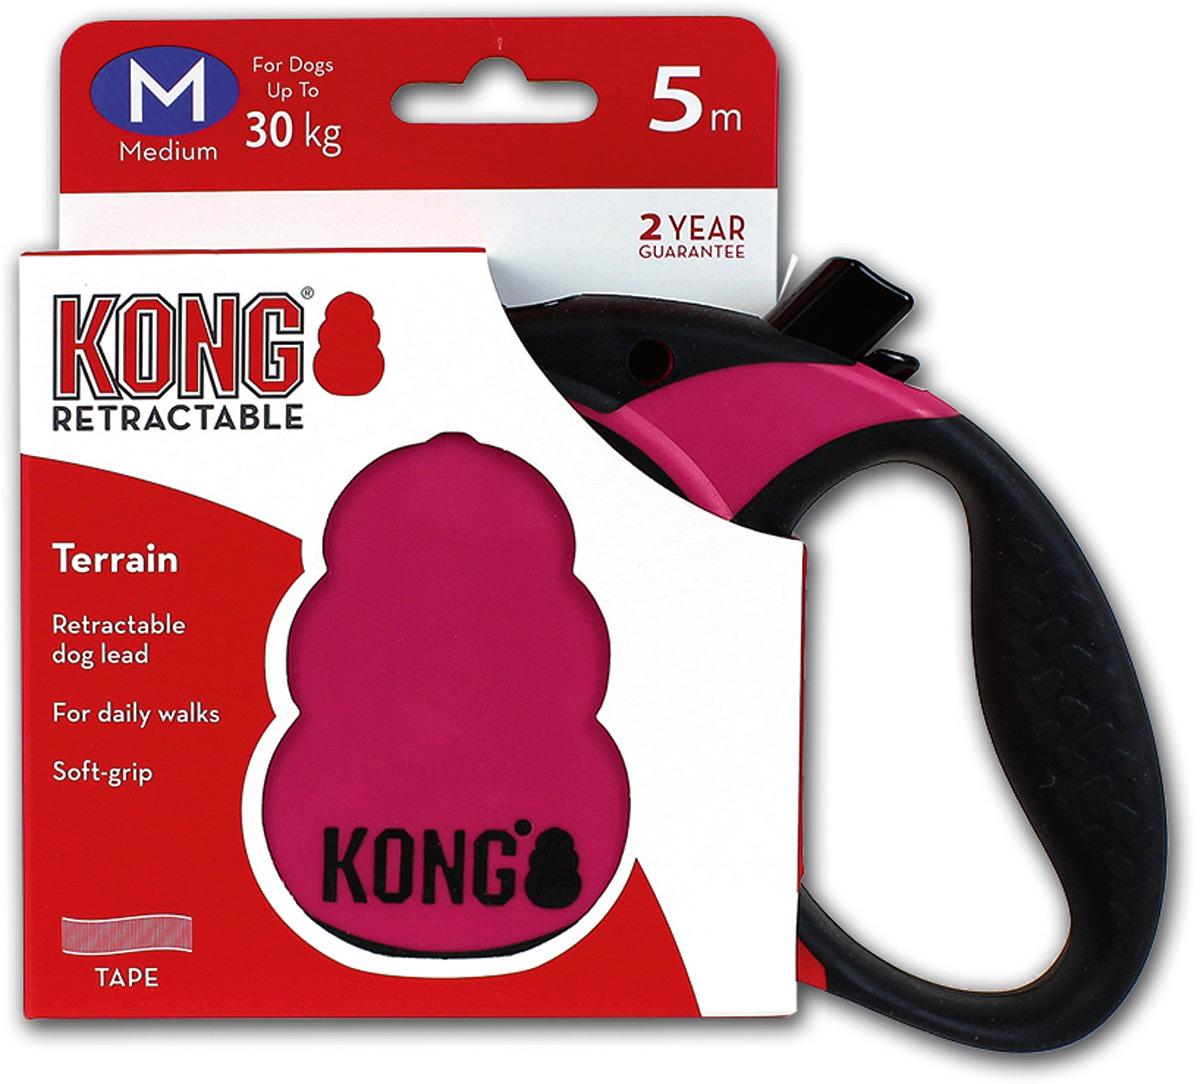 Поводок-рулетка для собак Kong Terrain M, цвет: фуксия, до 30 кг, 5 м